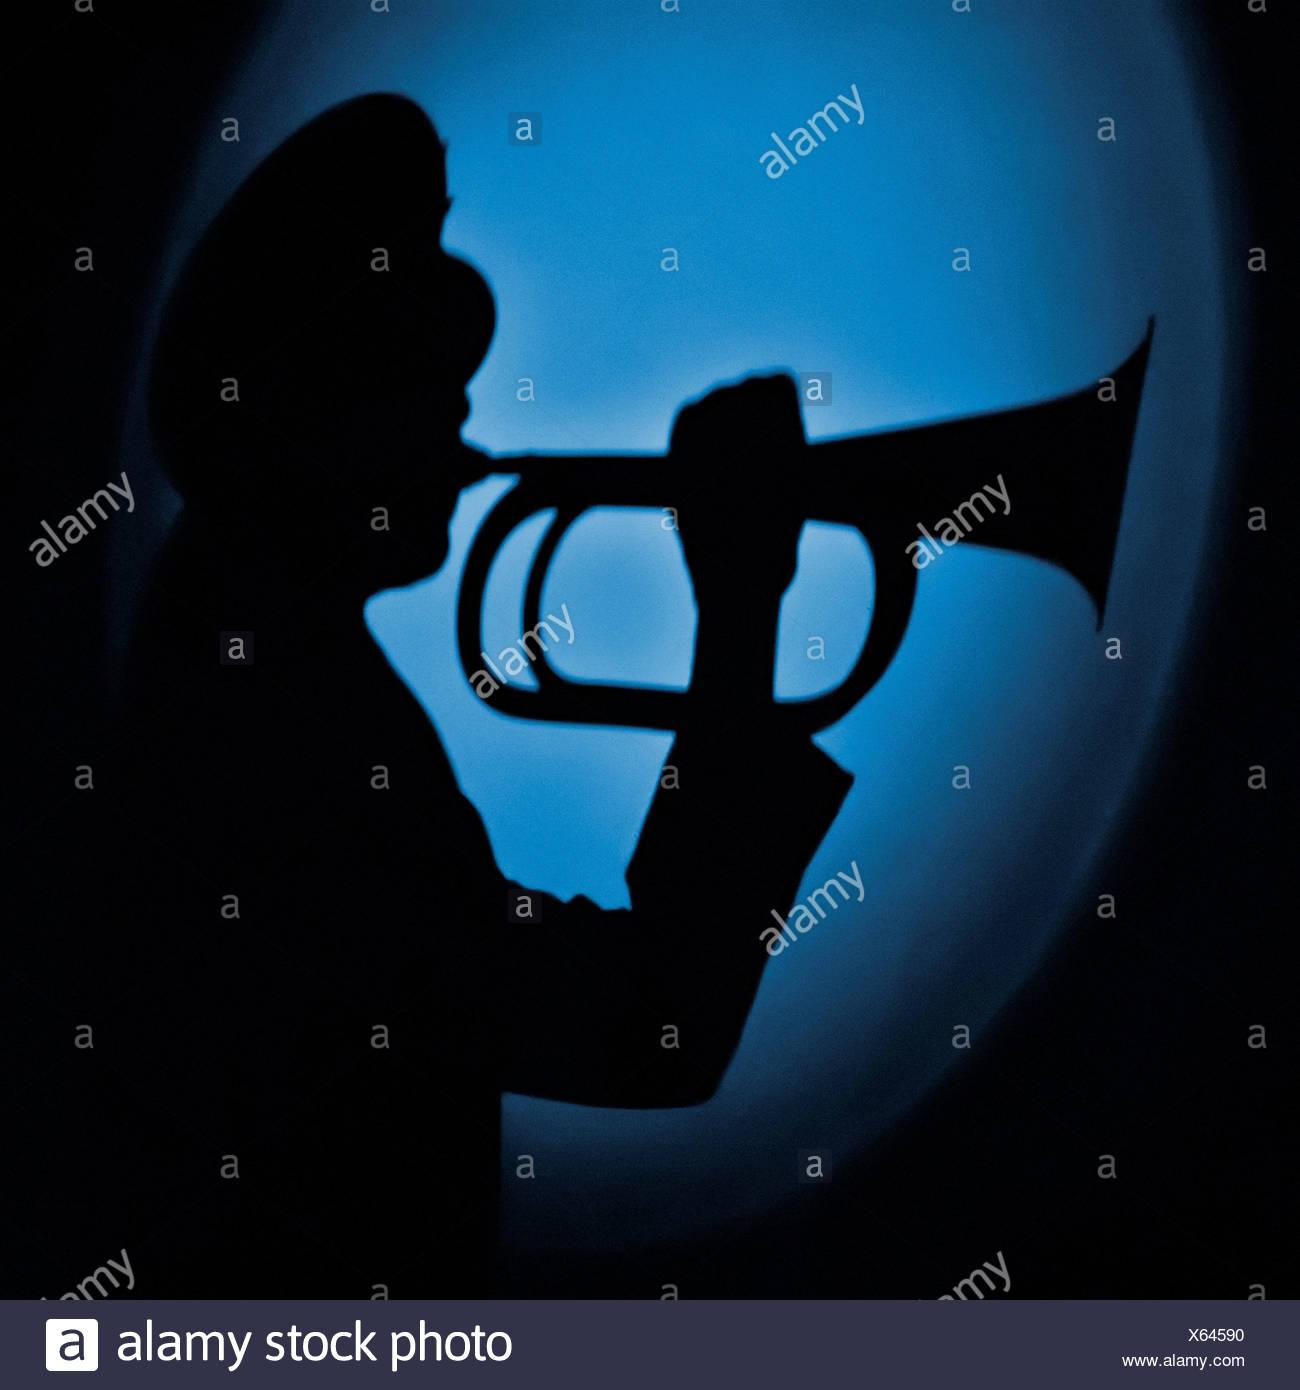 Shadow of Airman Playing Bugle - Stock Image